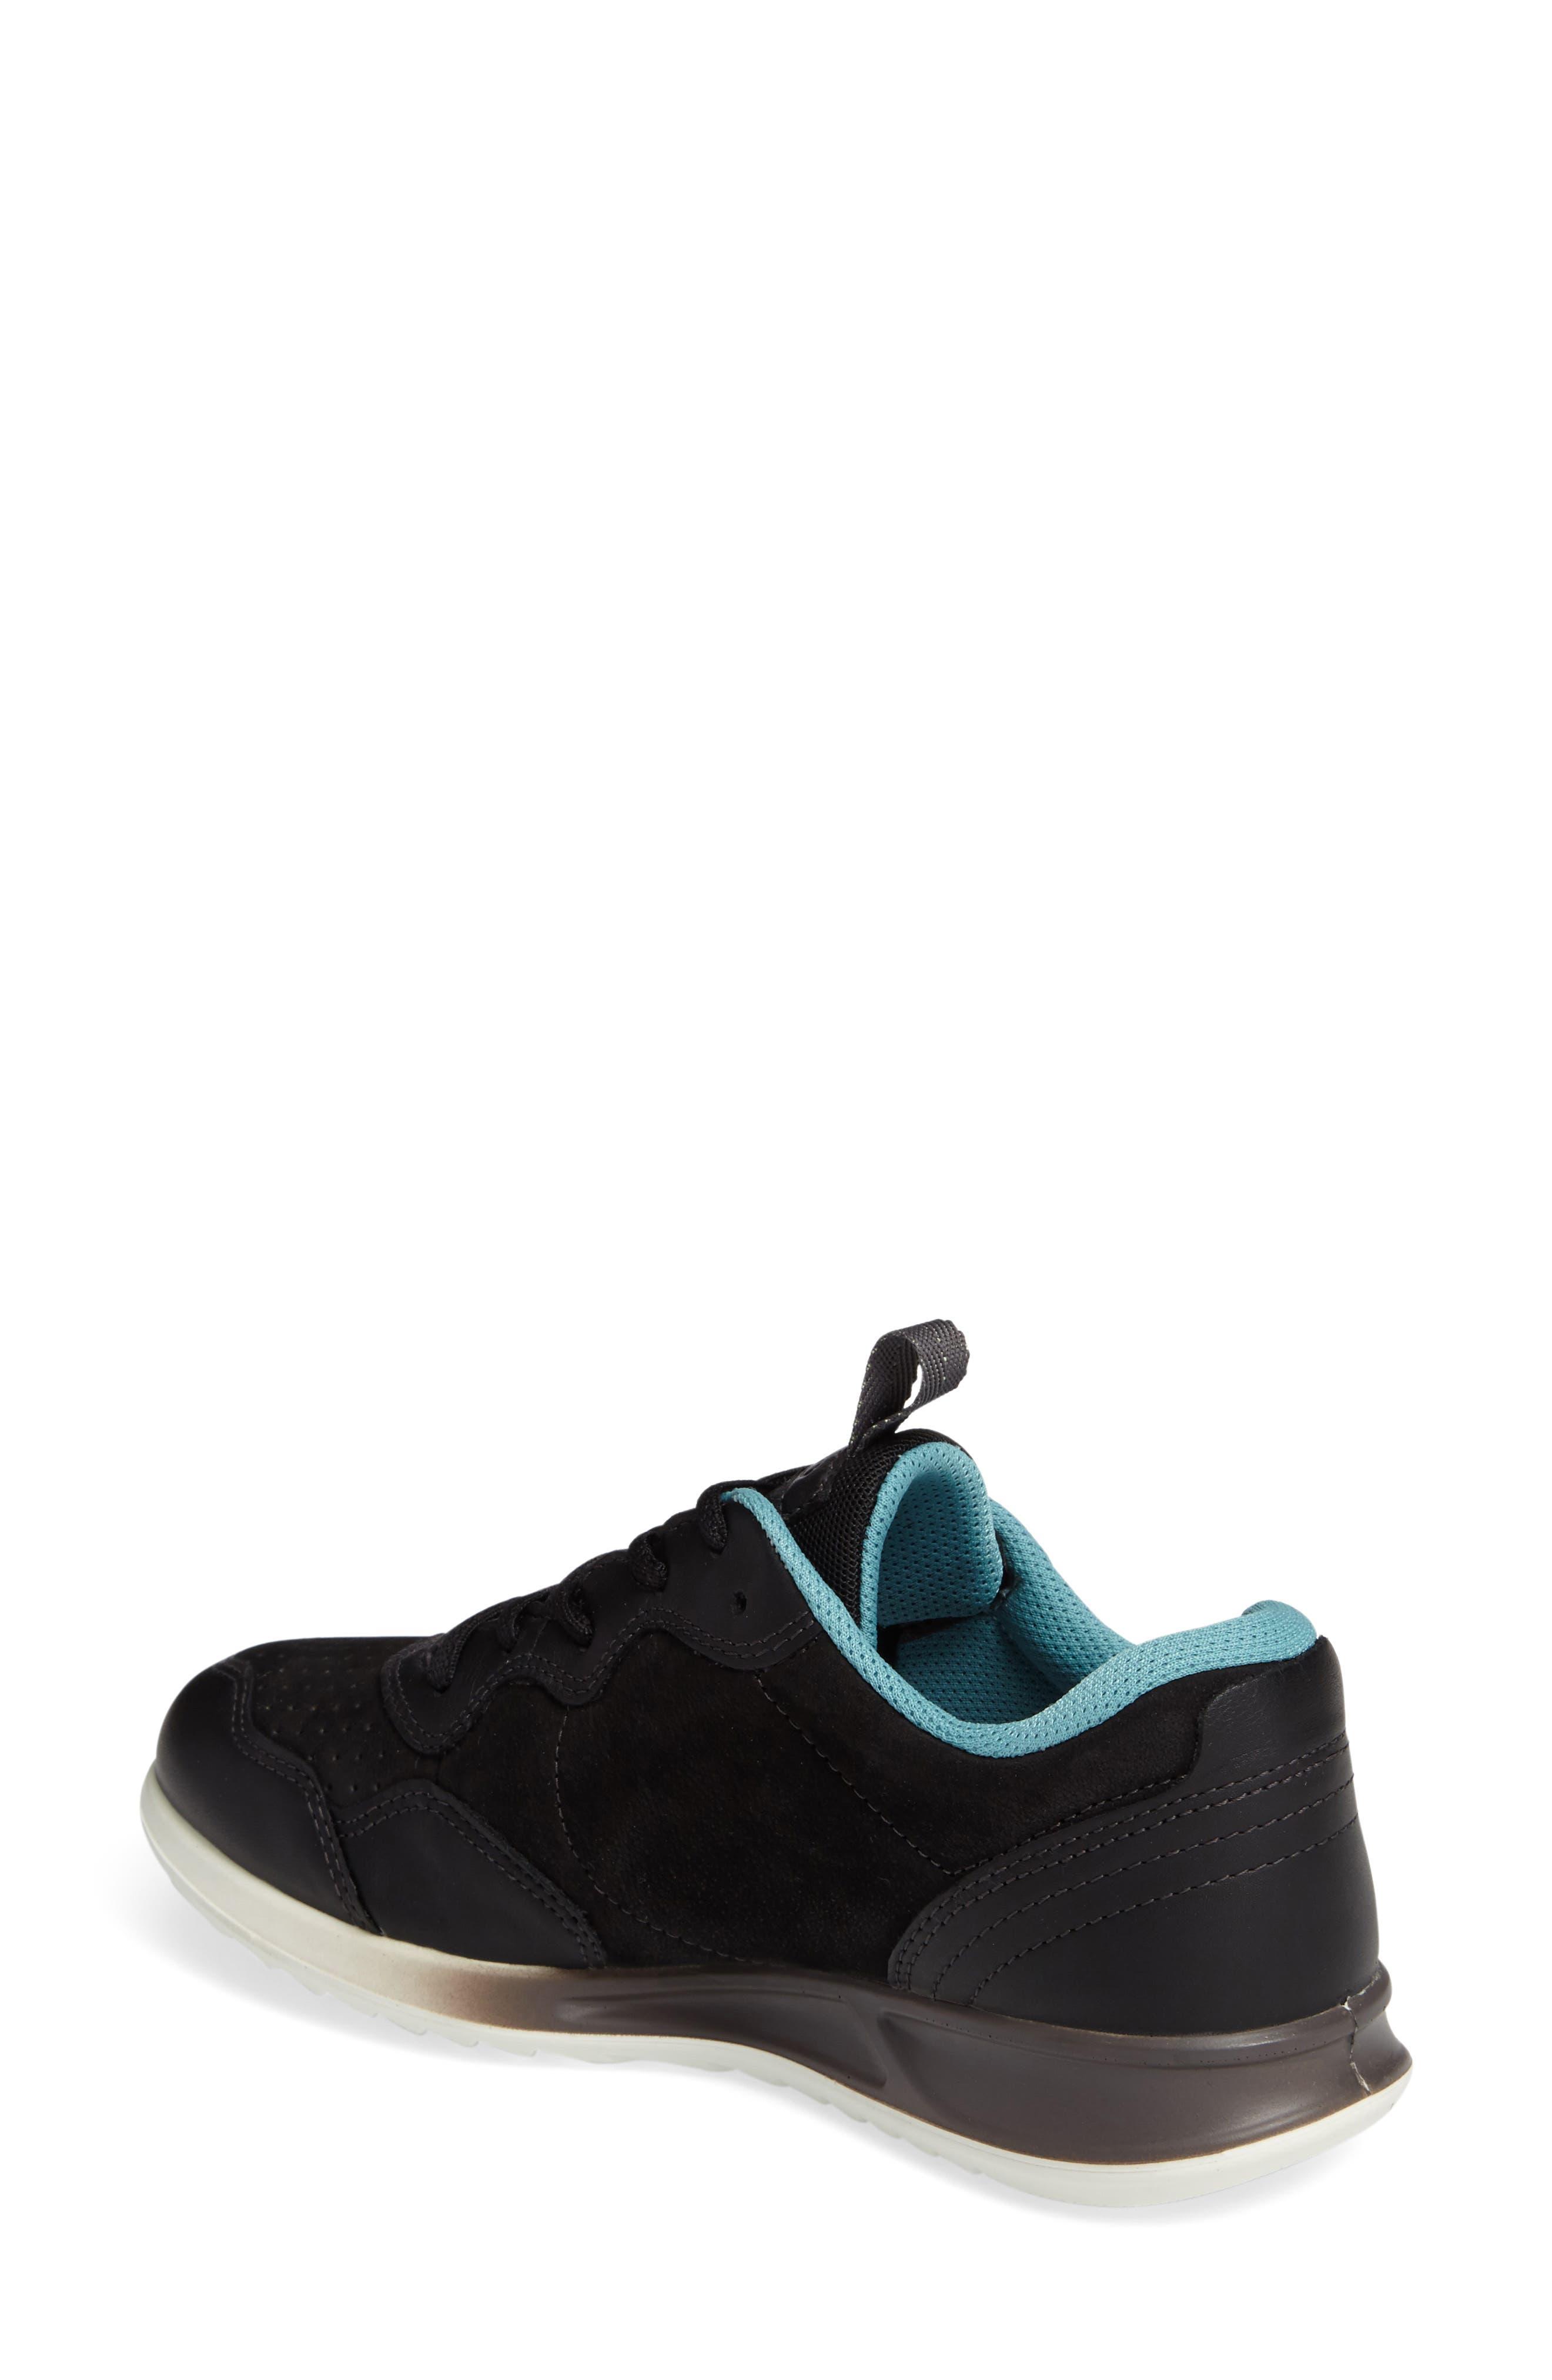 Genna Sneaker,                             Alternate thumbnail 5, color,